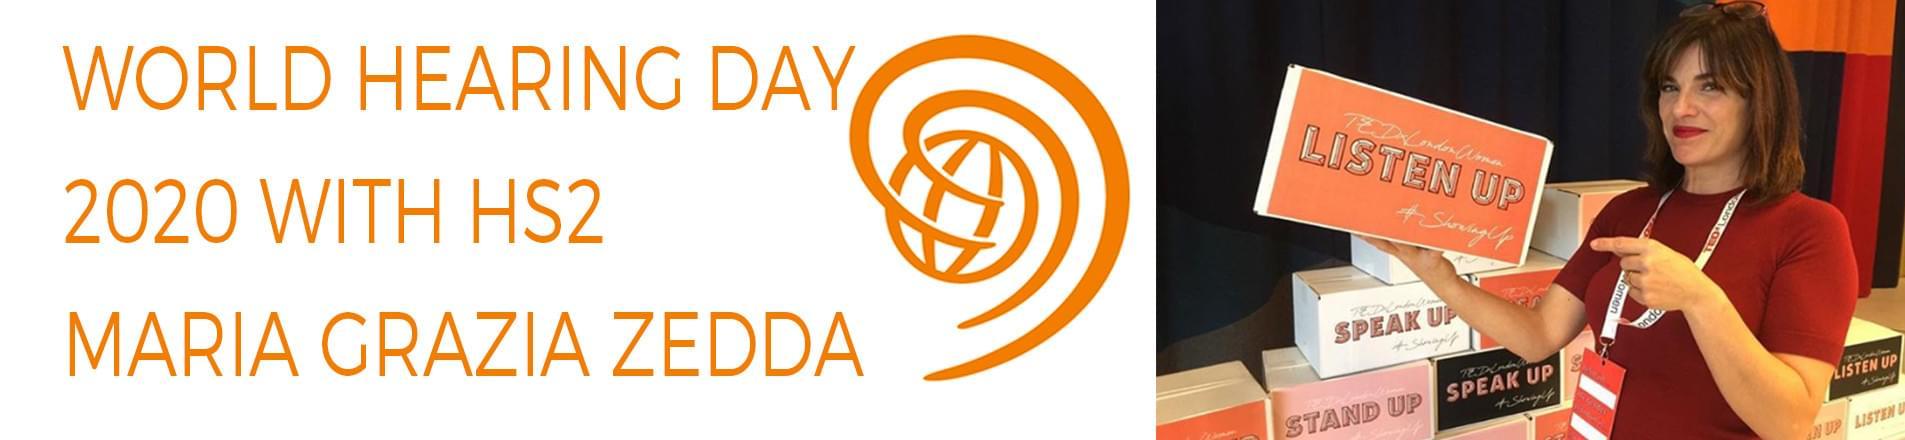 World Hearing Day with HS2: Maria Grazia Zedda's Story